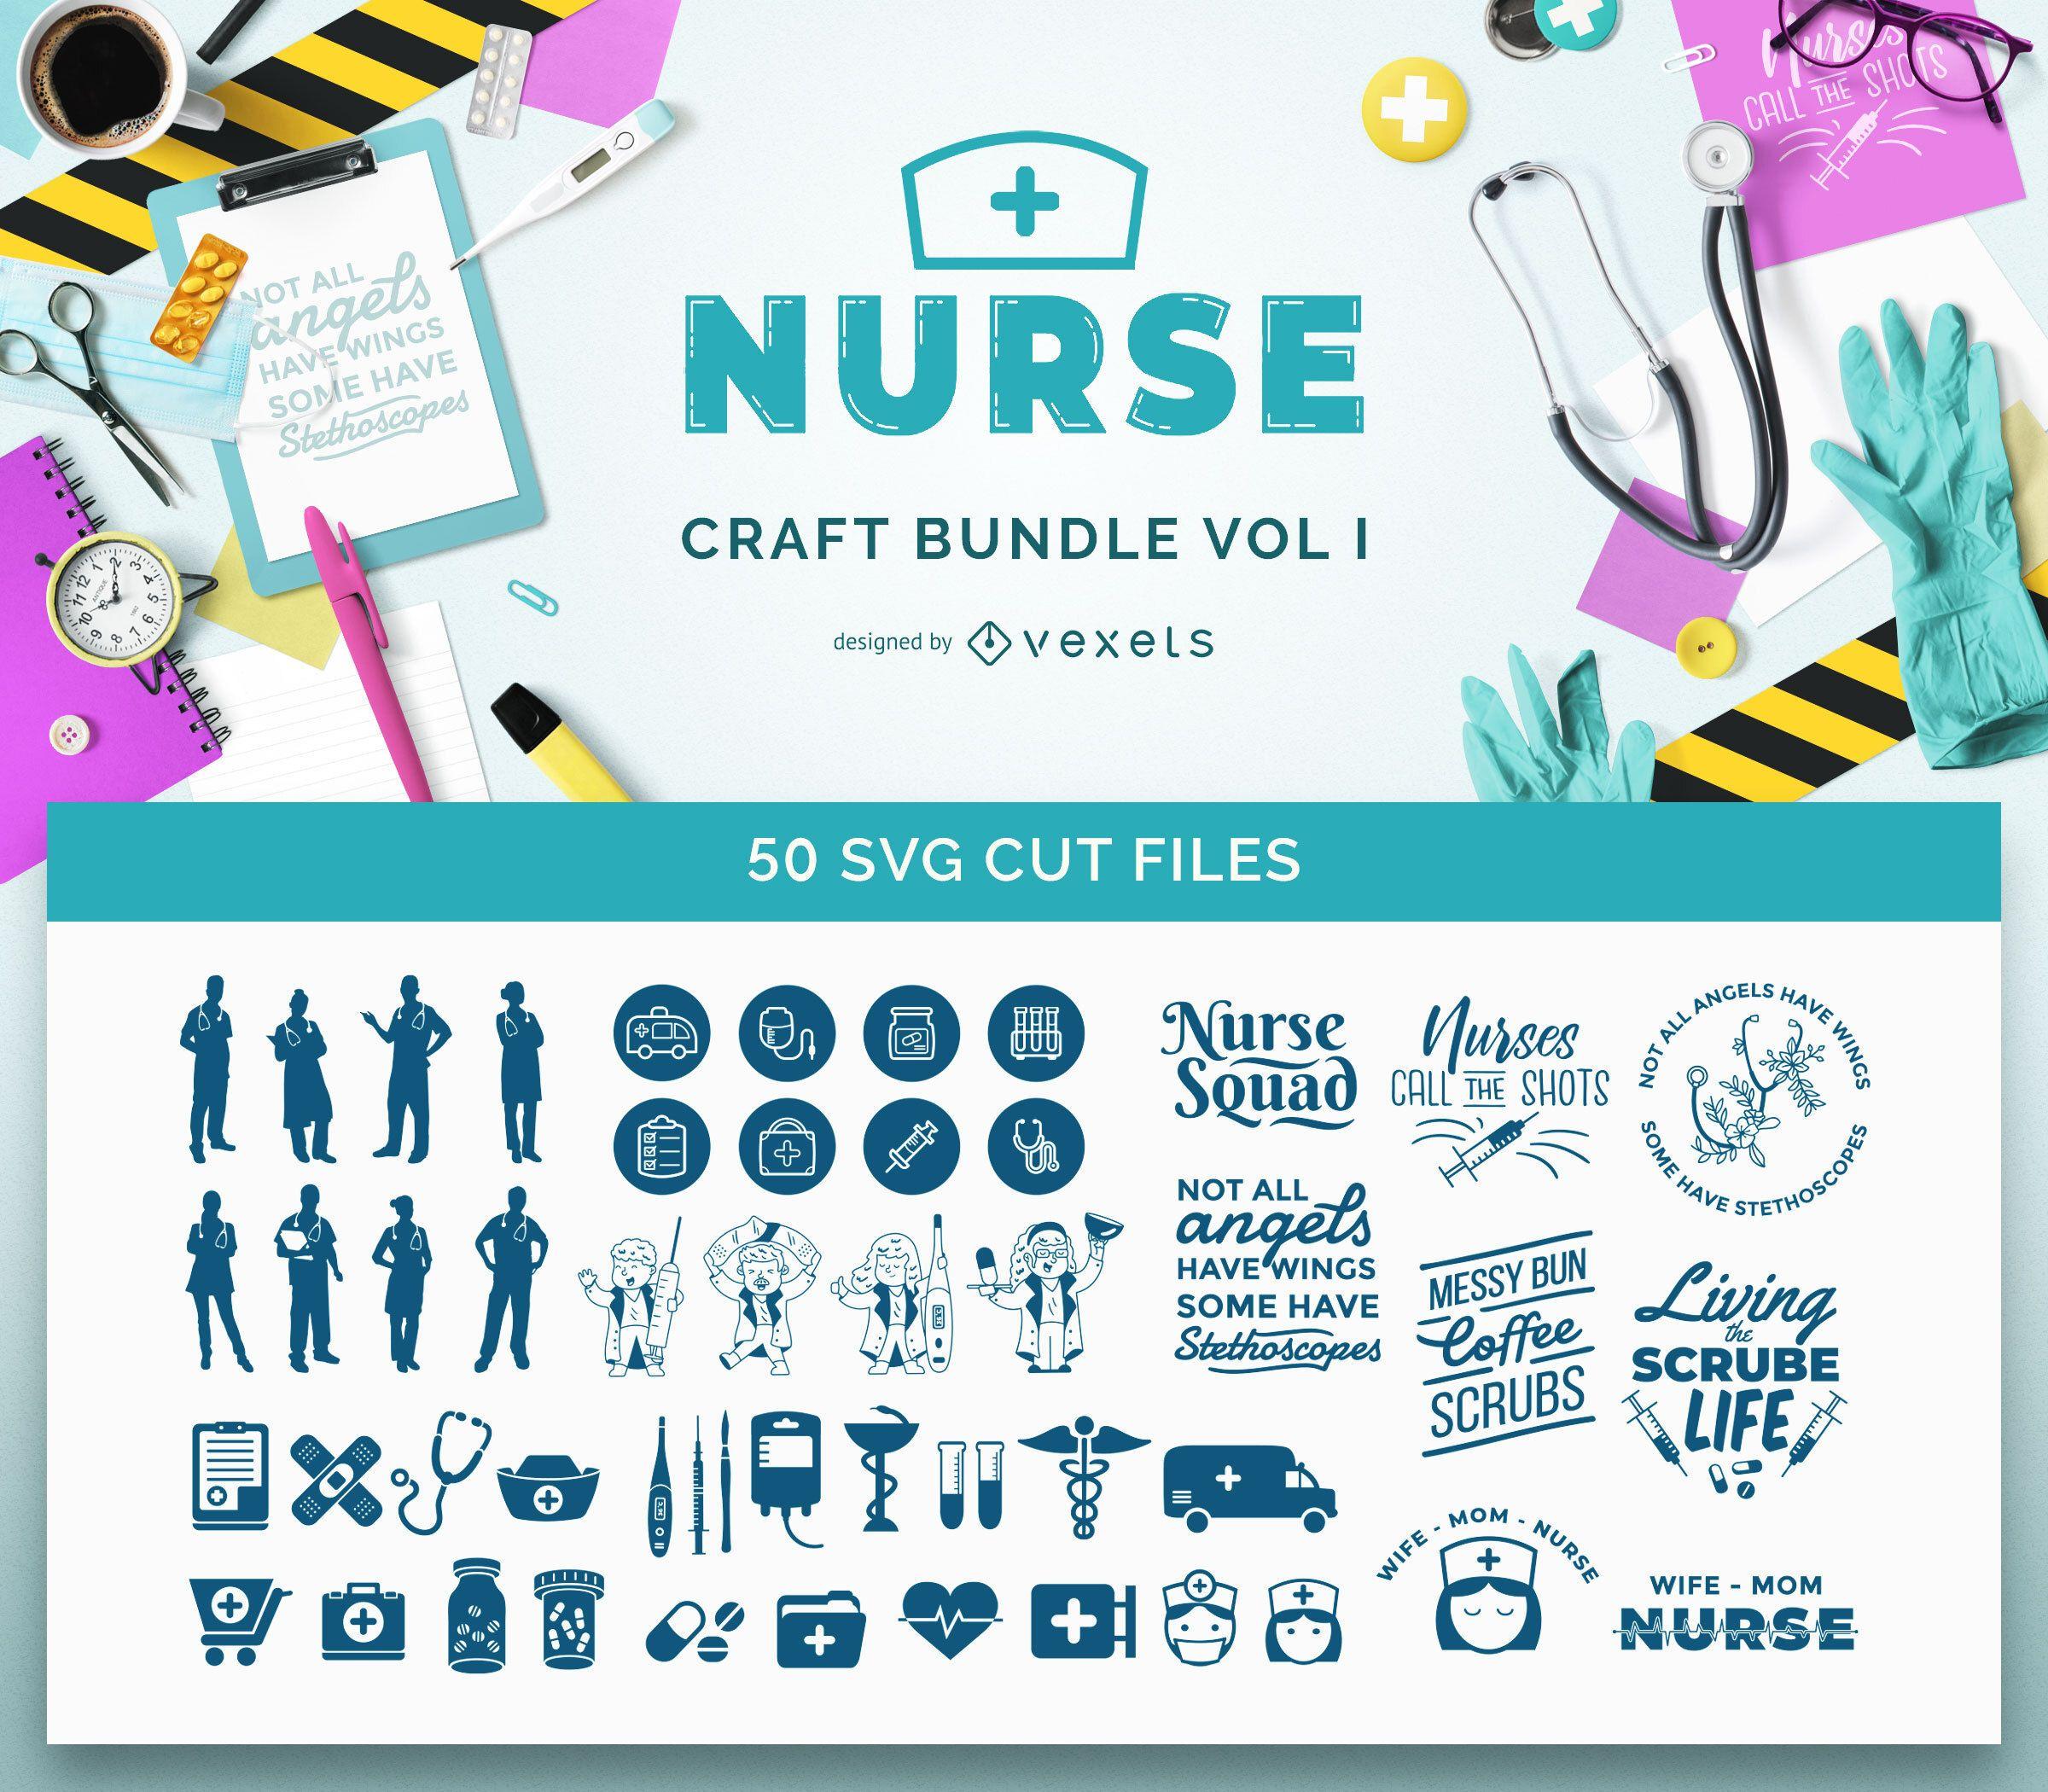 Nurse SVG Bundle Vol I